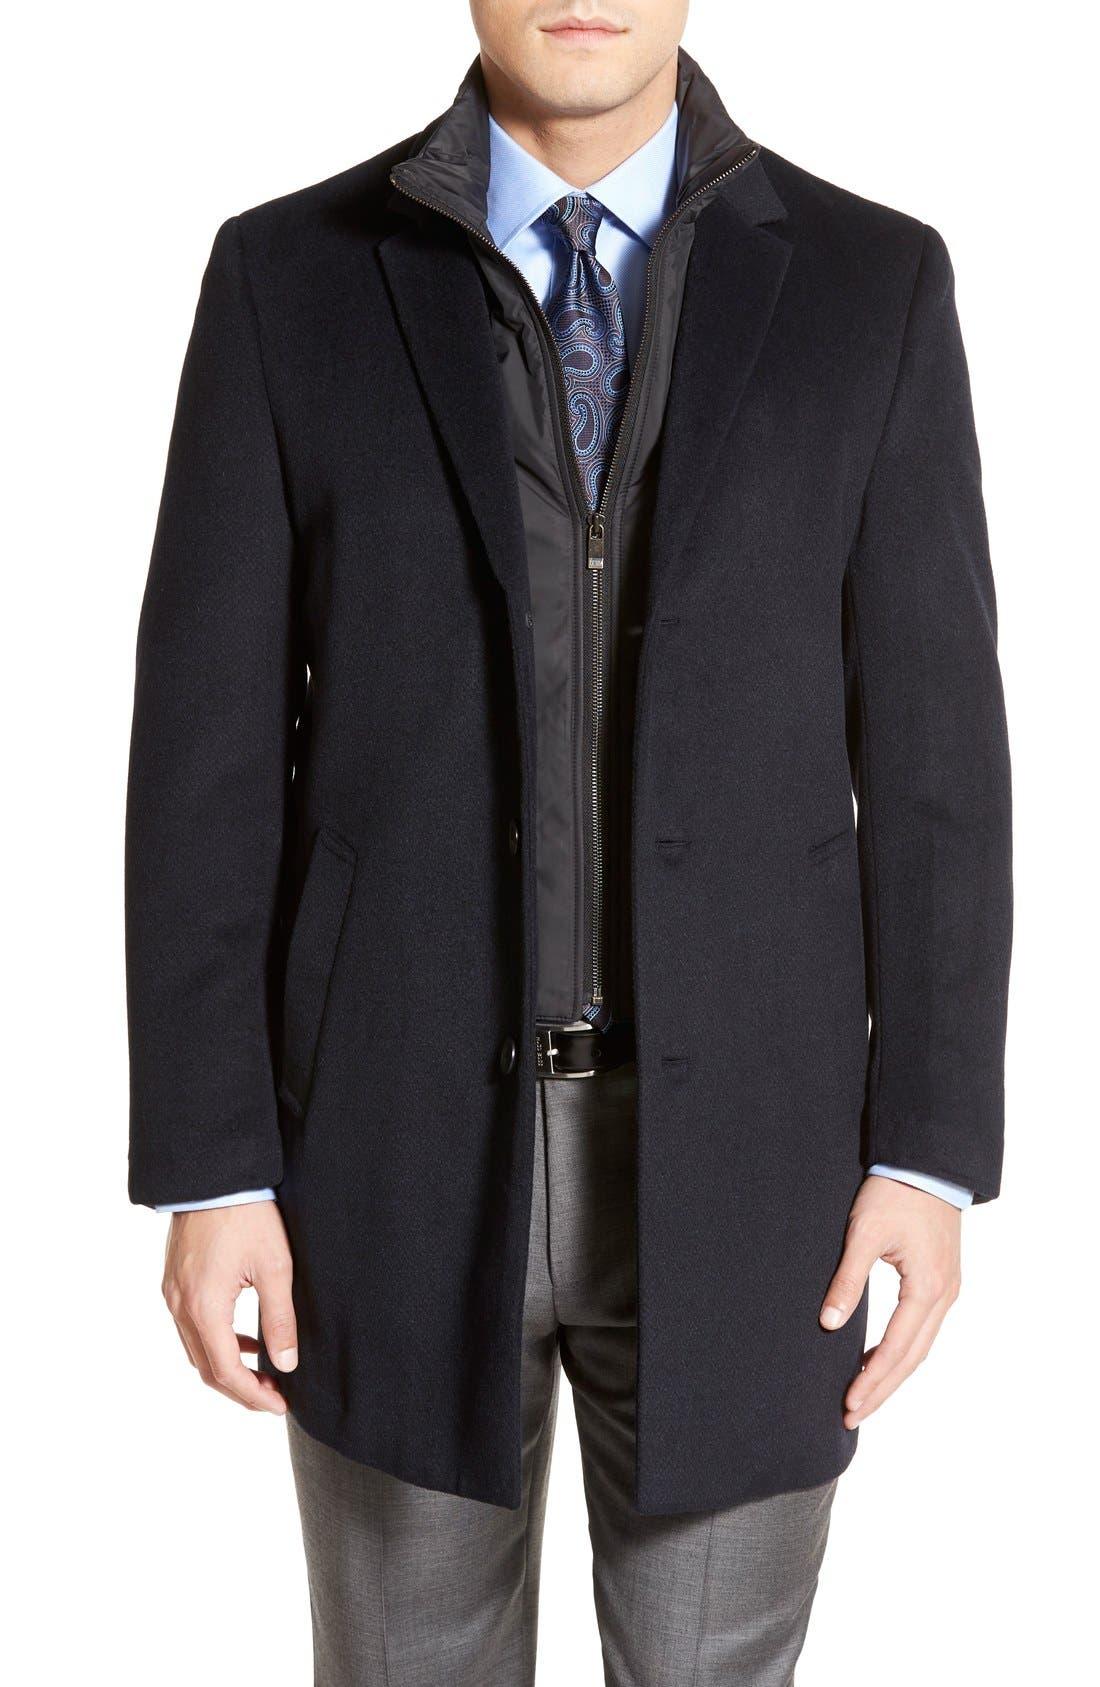 Hart Schaffner Marx Kingman Modern Fit Wool Blend Coat with Removable Zipper Bib